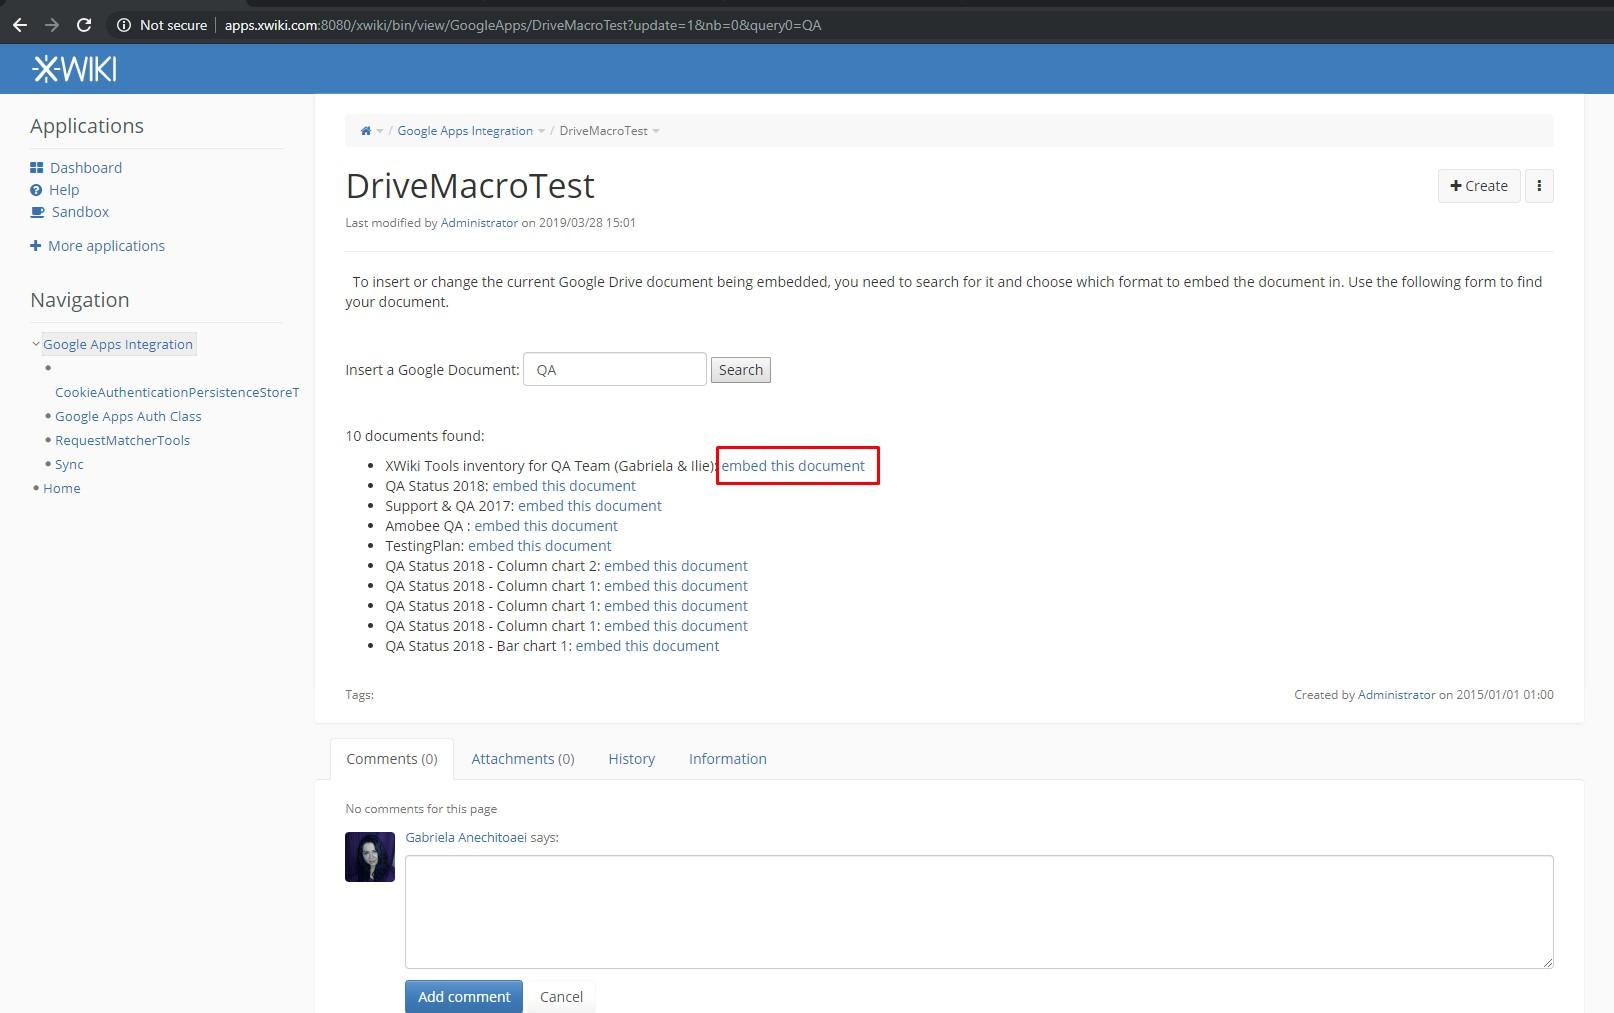 ClickingOnDriveMacroTest